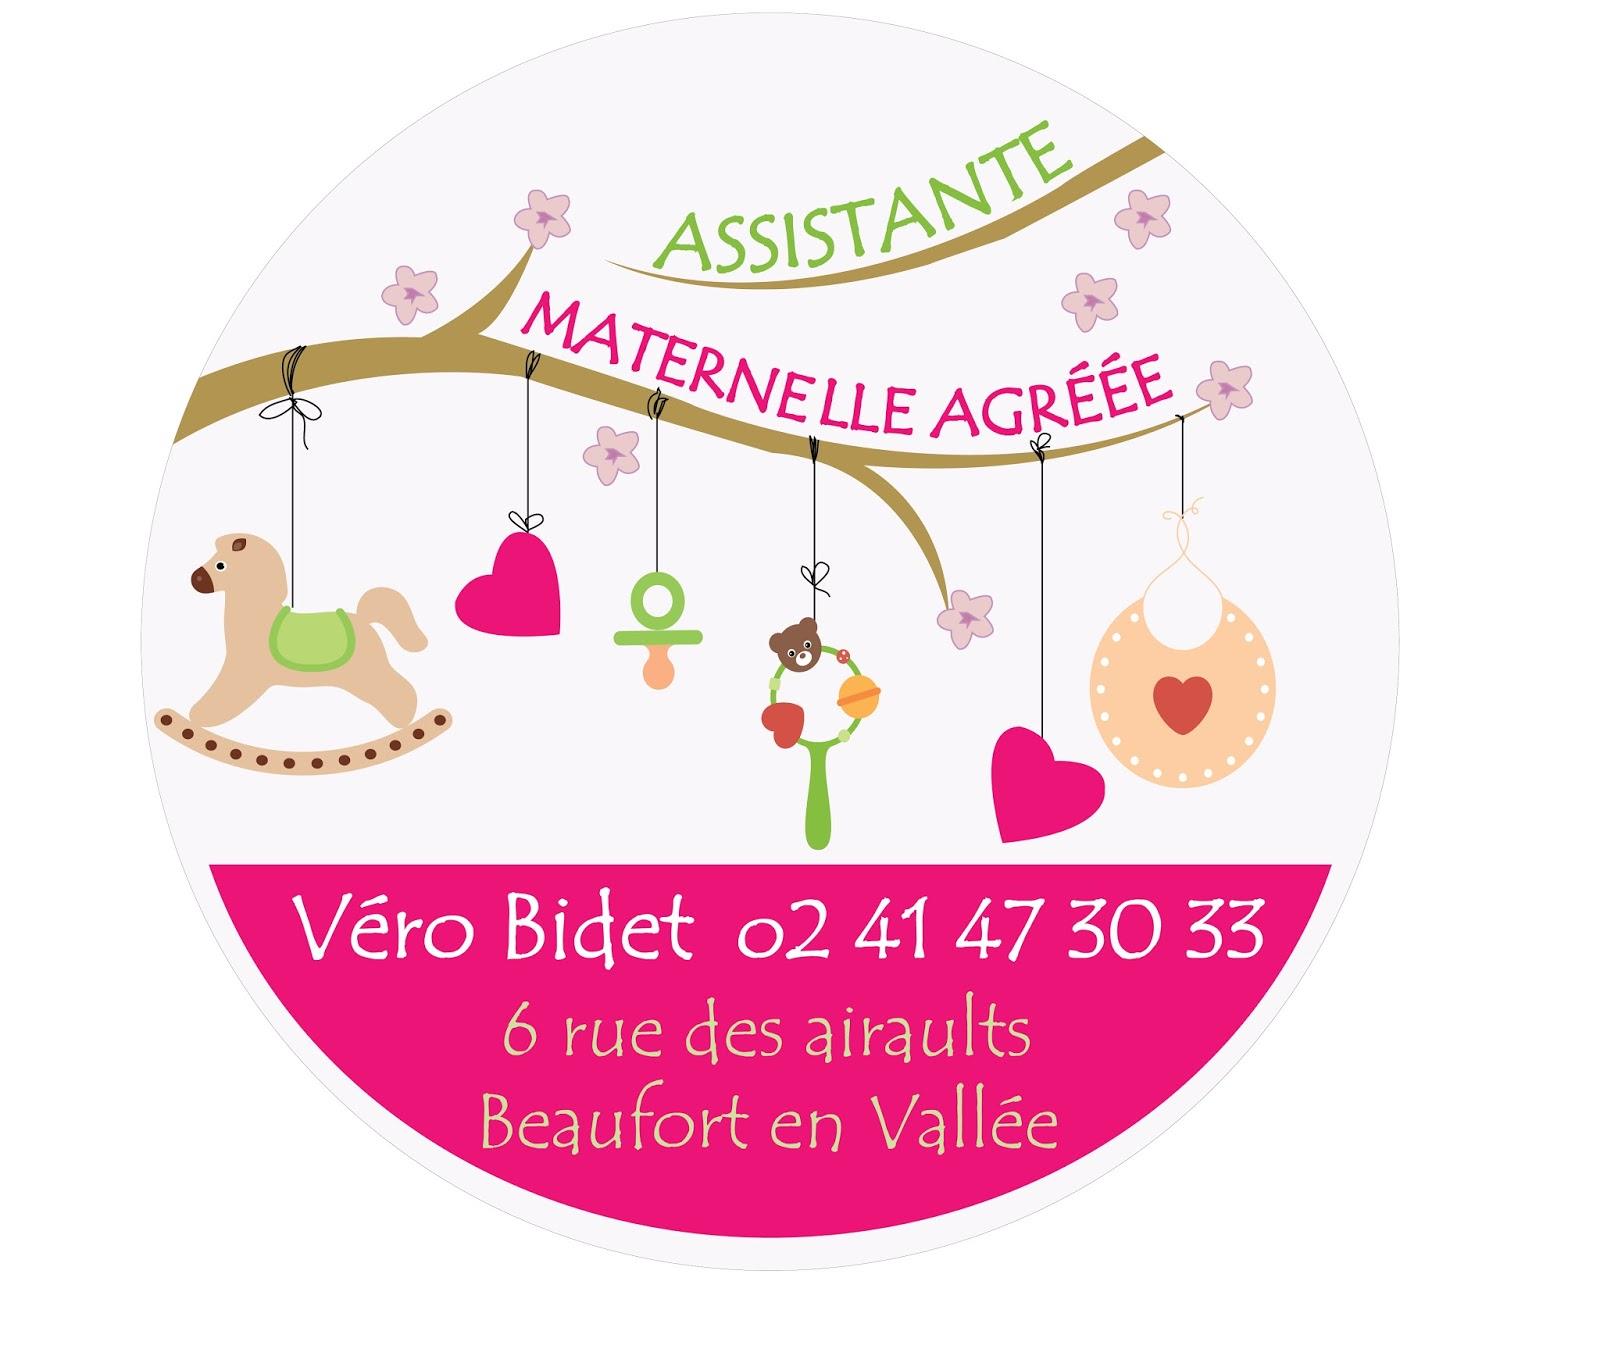 carte de visite assistante maternelle Alexa.B: Assistante Maternelle ( Carte de Visite, Flyer, Affiche  )